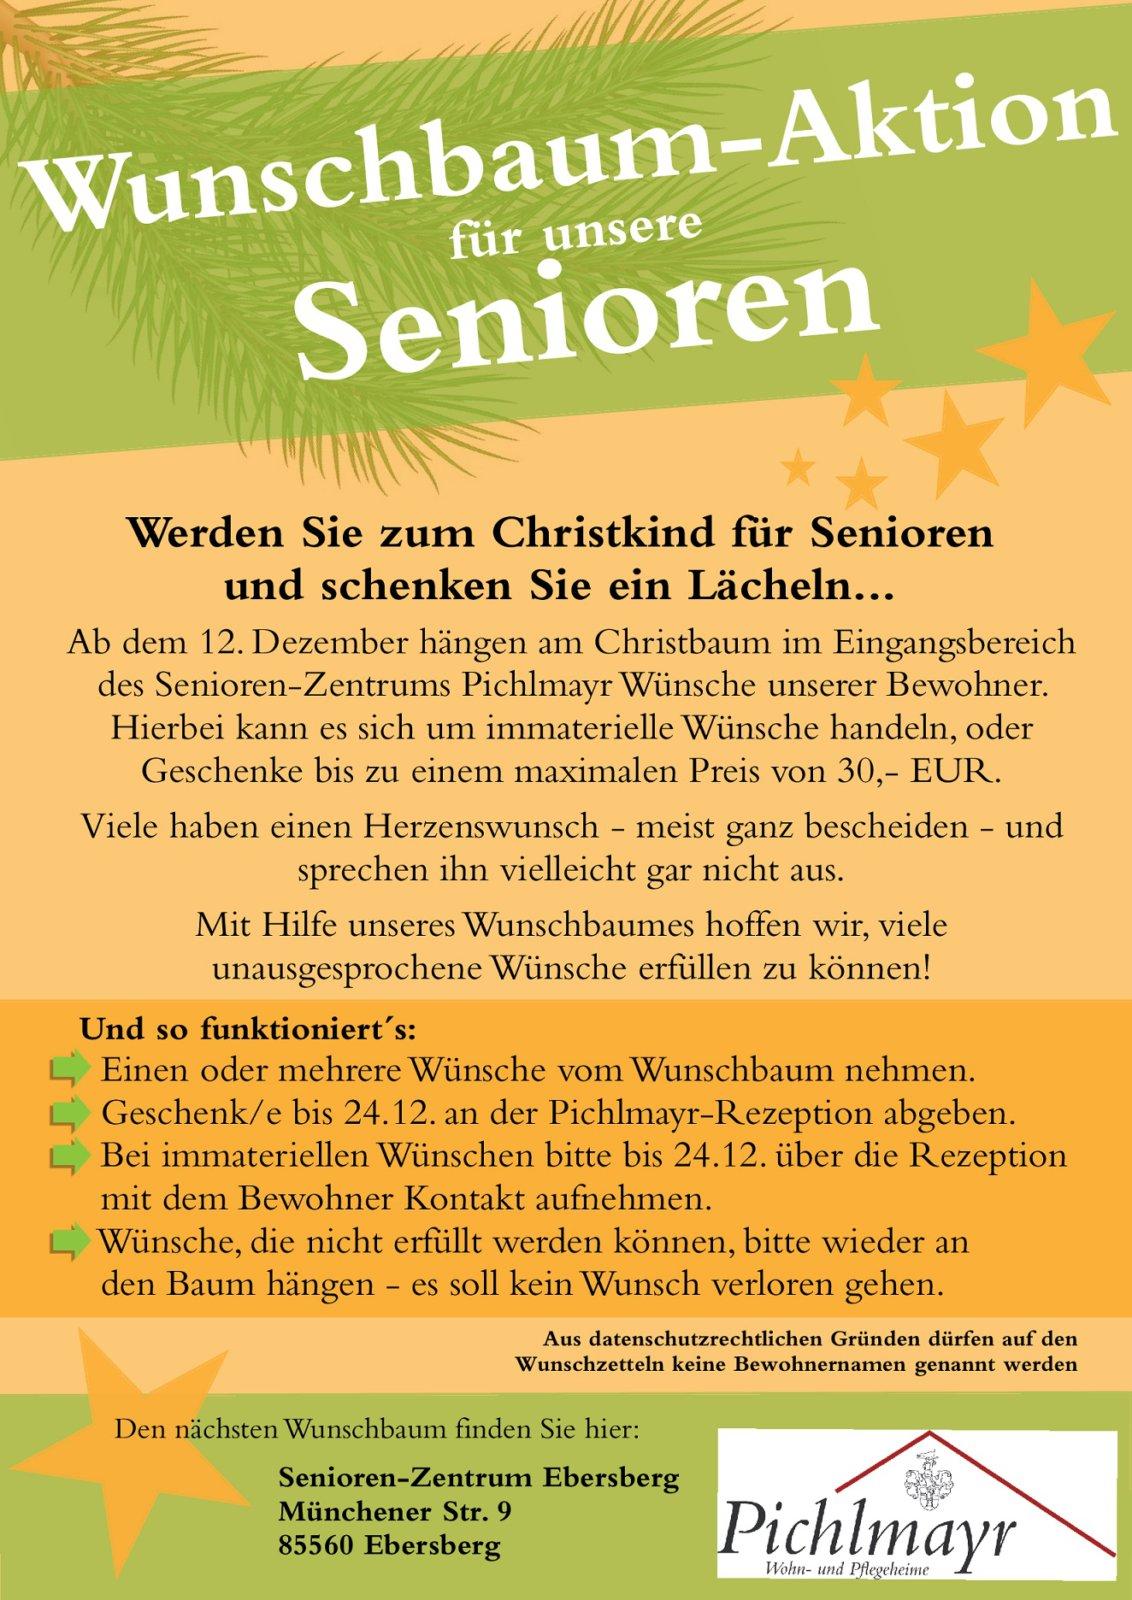 80 Aktion Wunschbaum Plakat Ebersberg